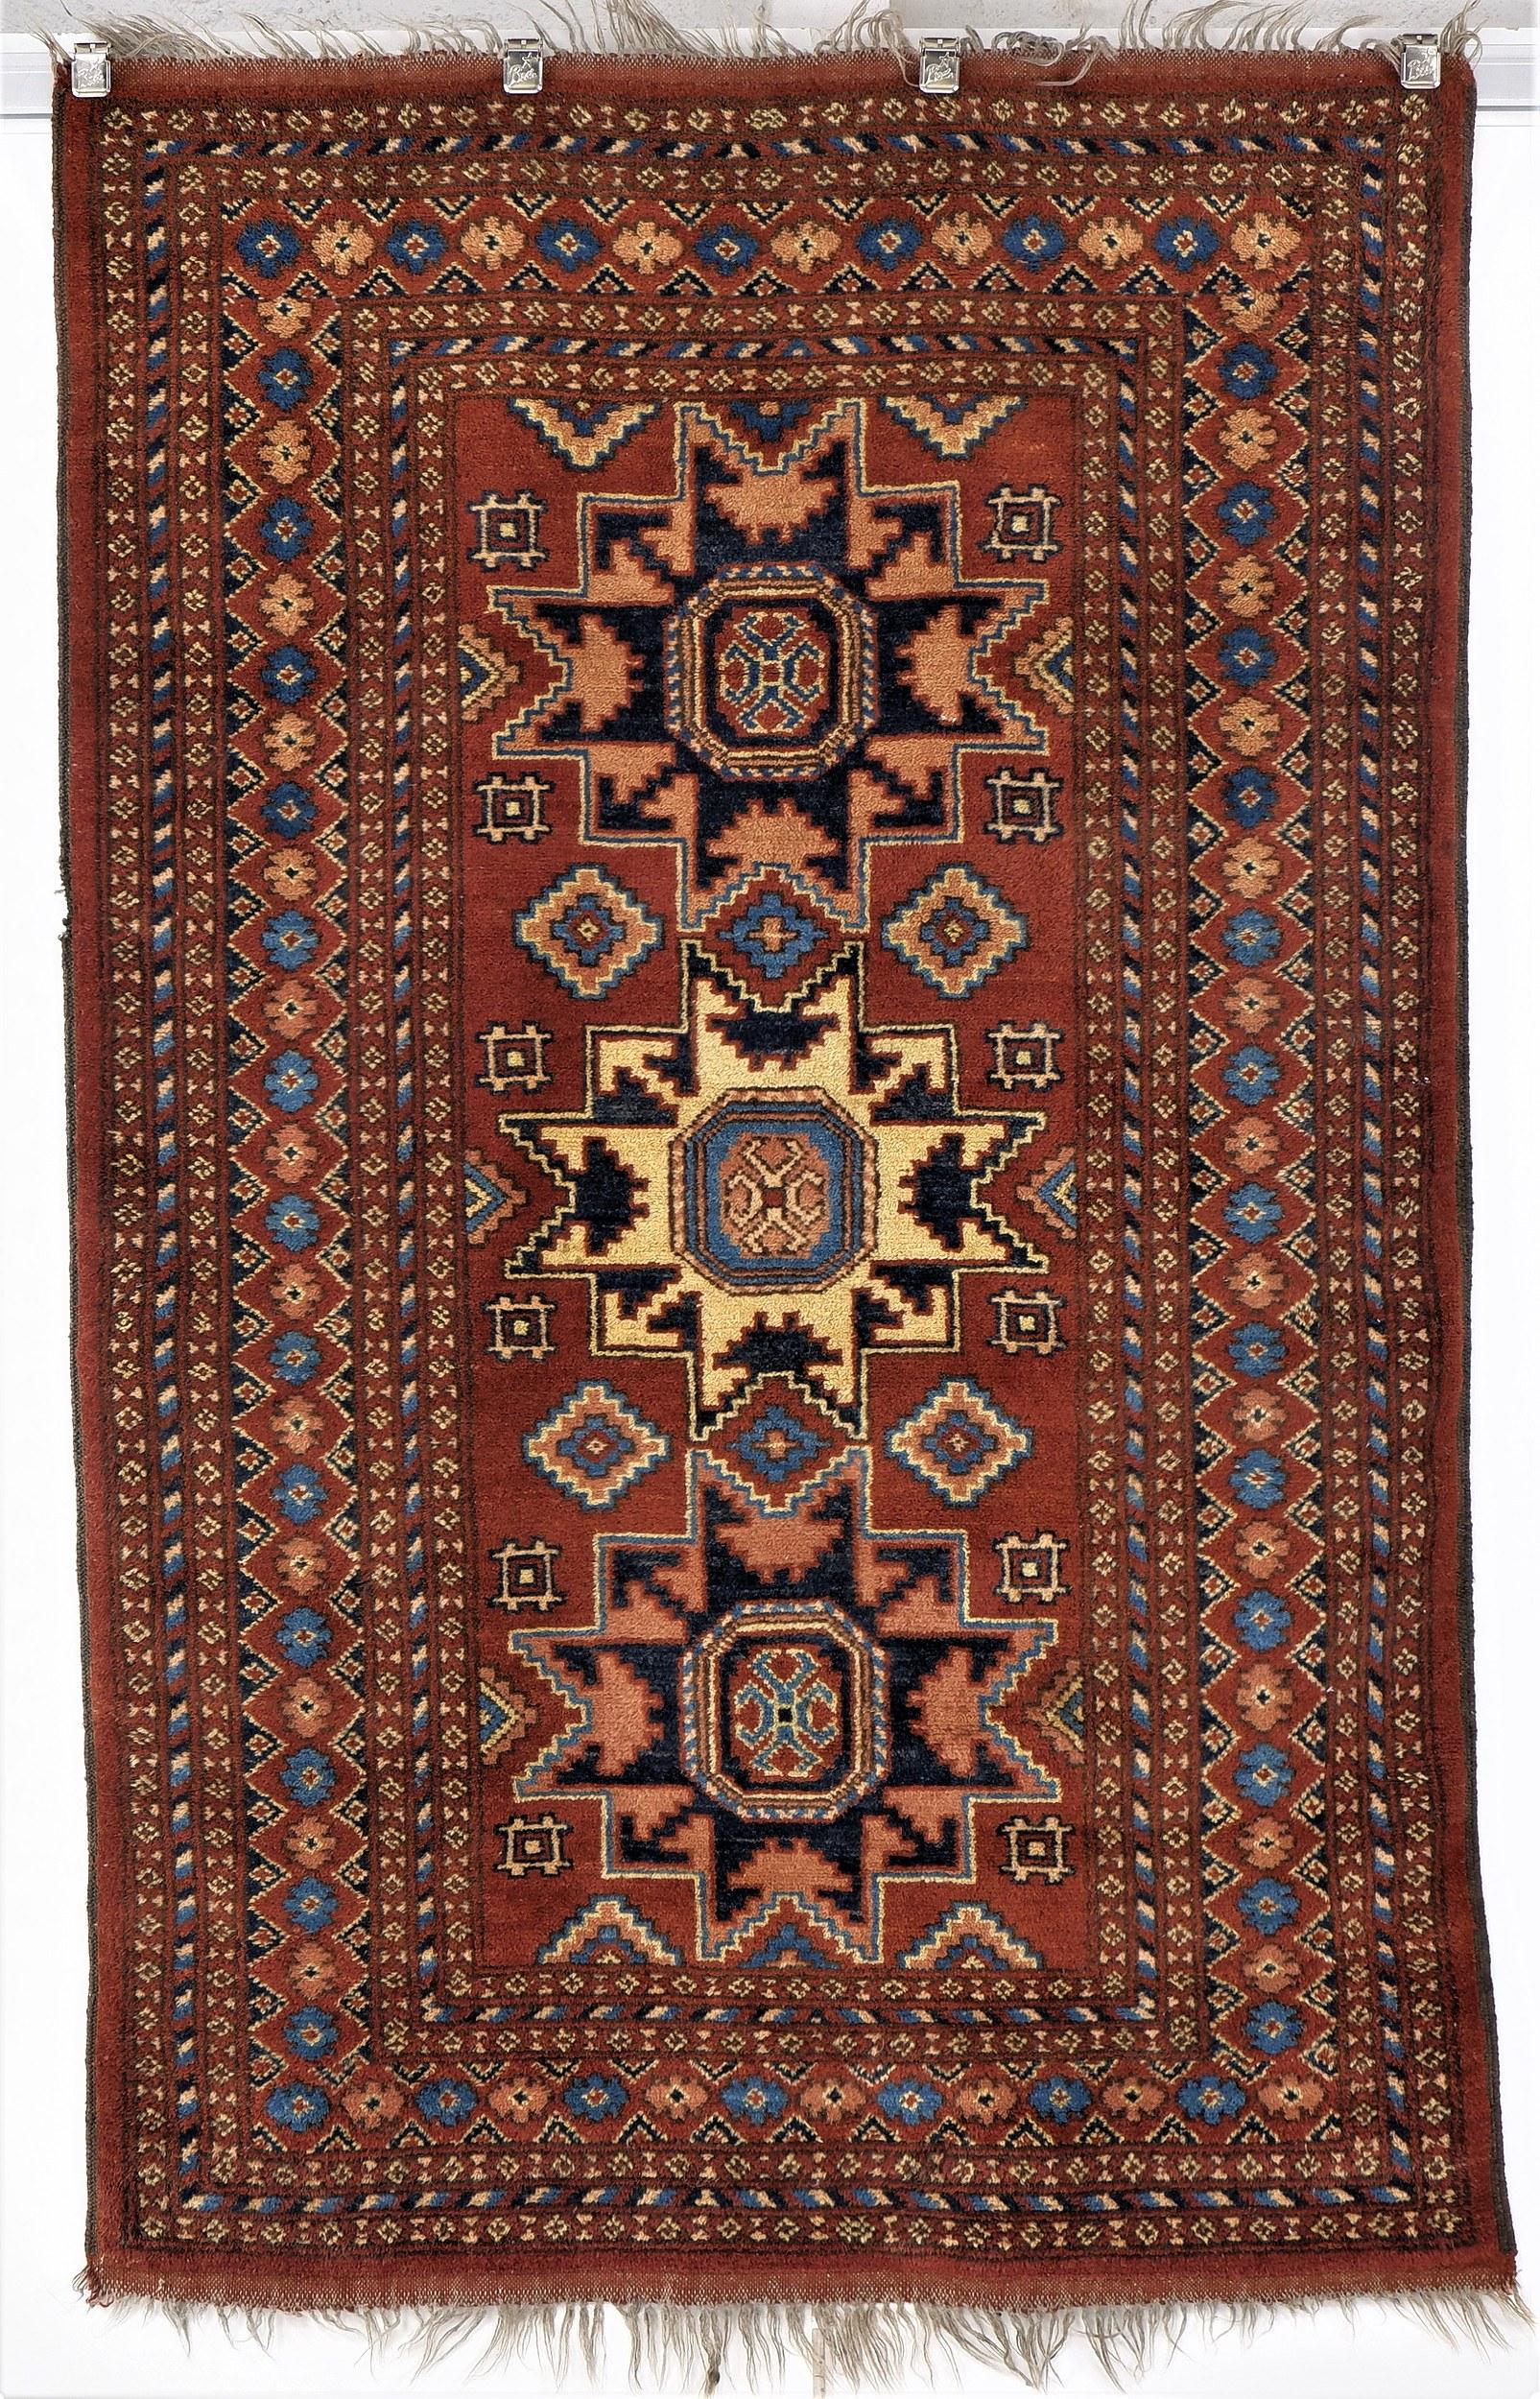 'Afghan Star Kazakh Design Hand Knotted Soft Wool Rug '